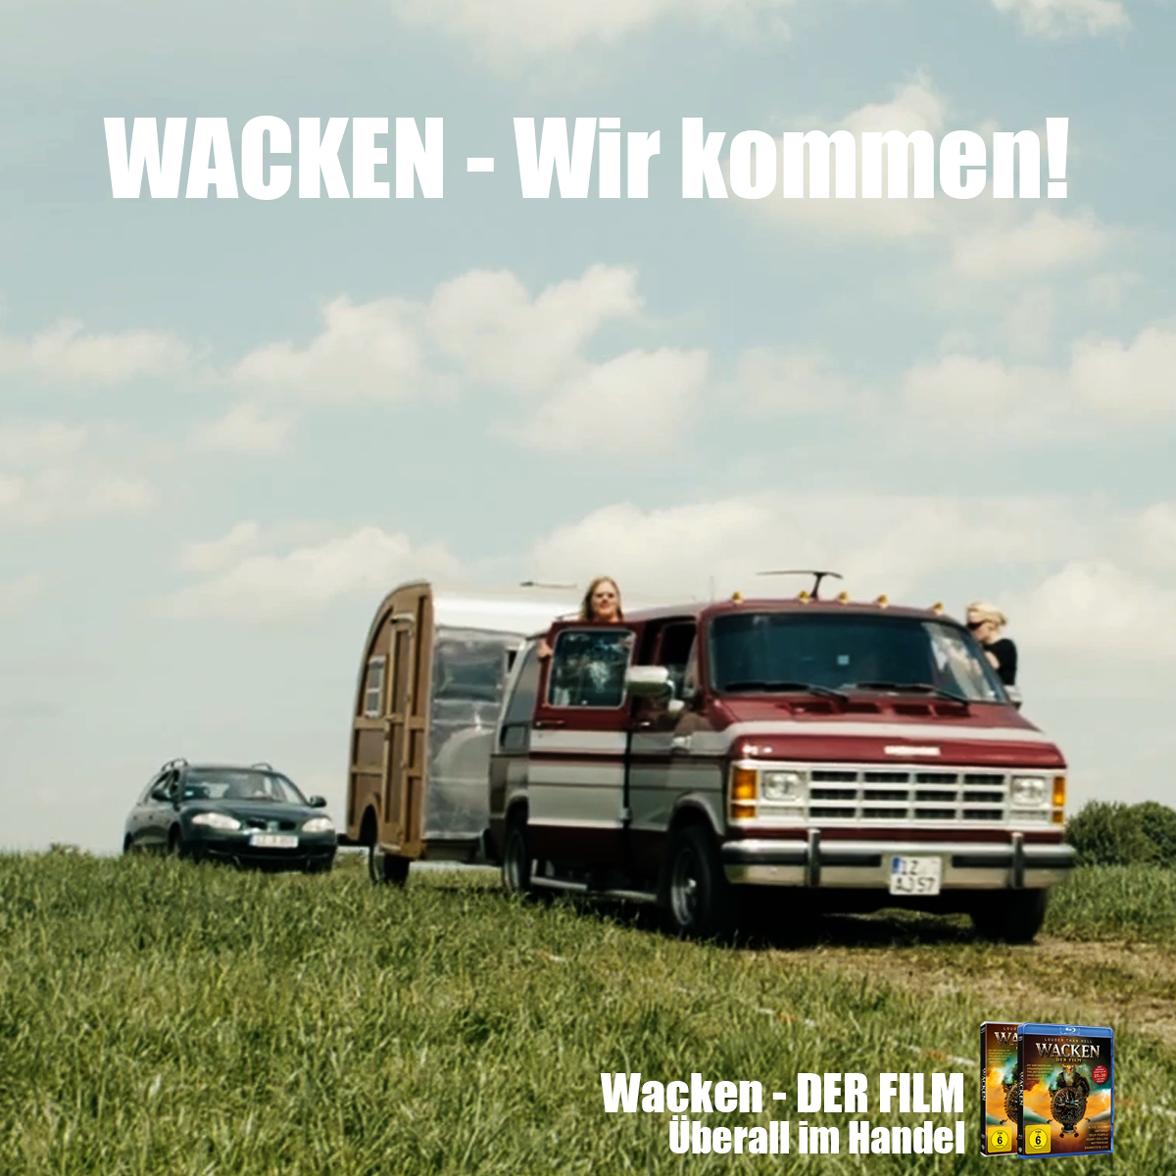 Wacken_Wir-kommen.png